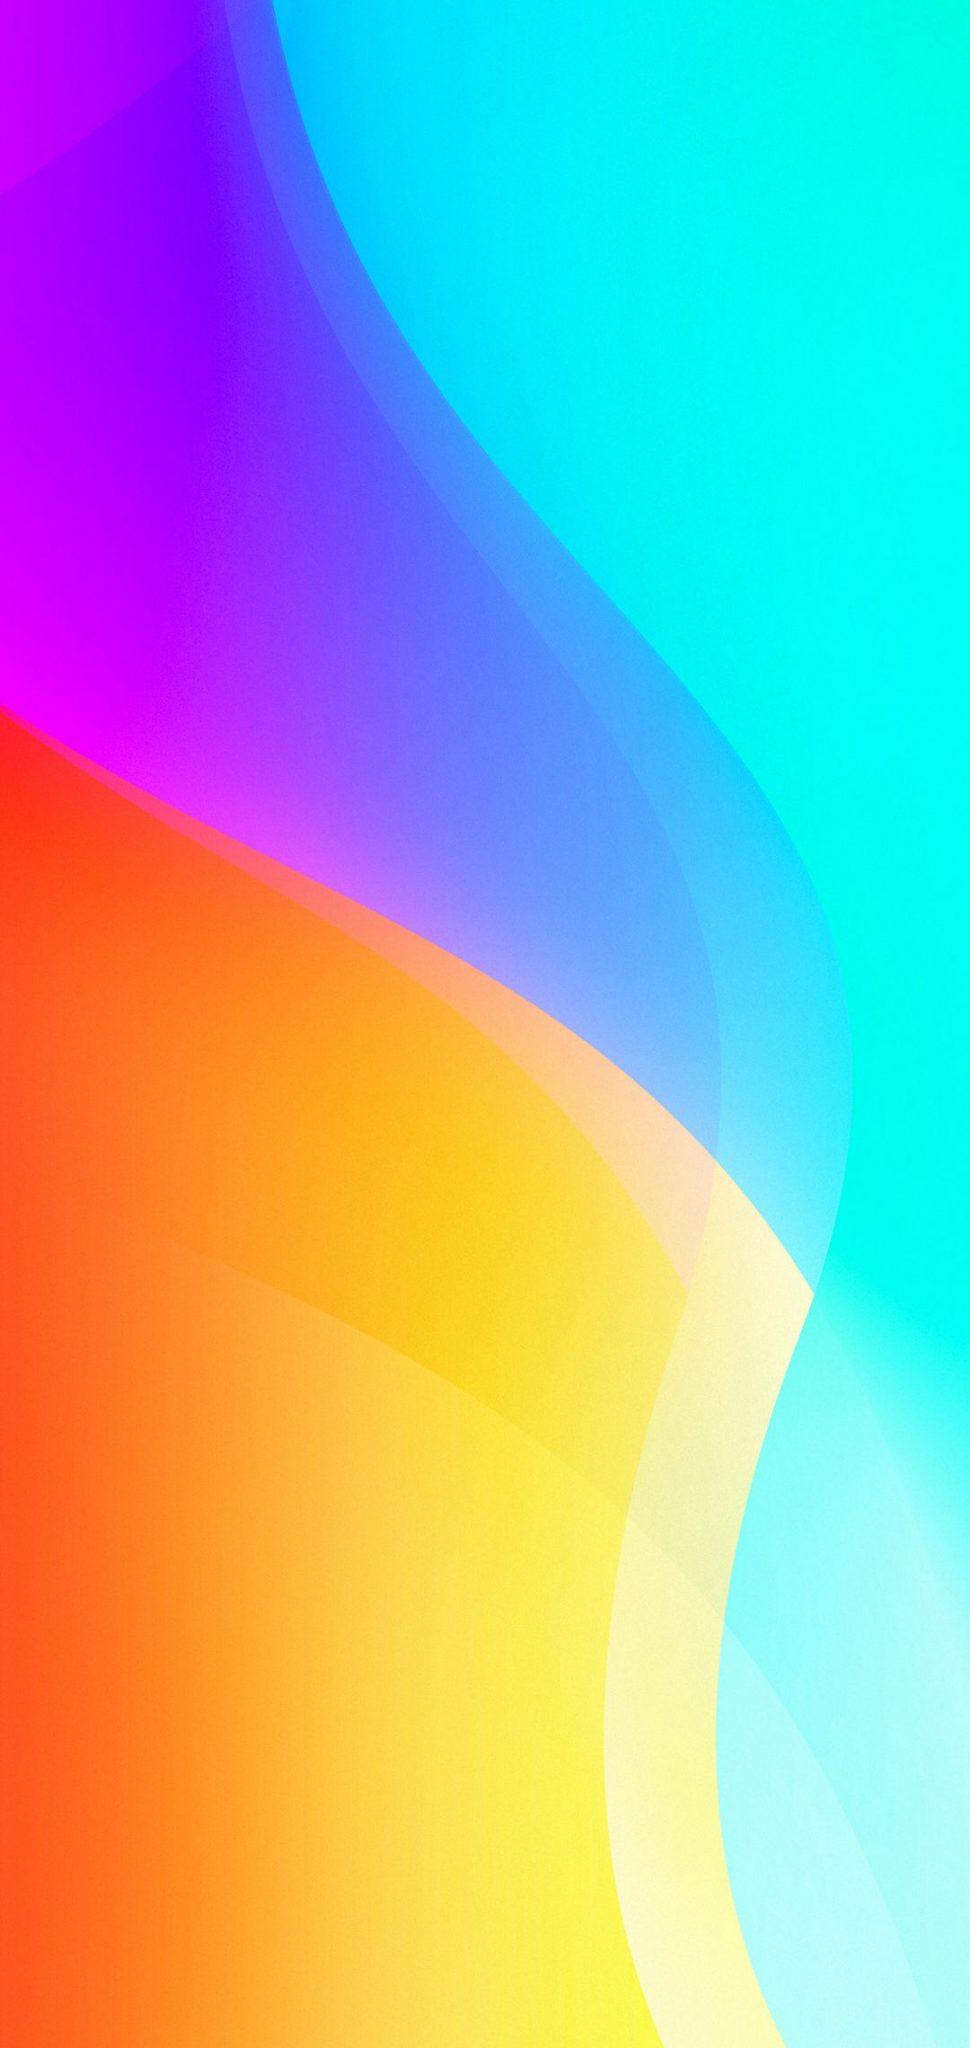 Vivo-V11-Wall-TechFoogle-03